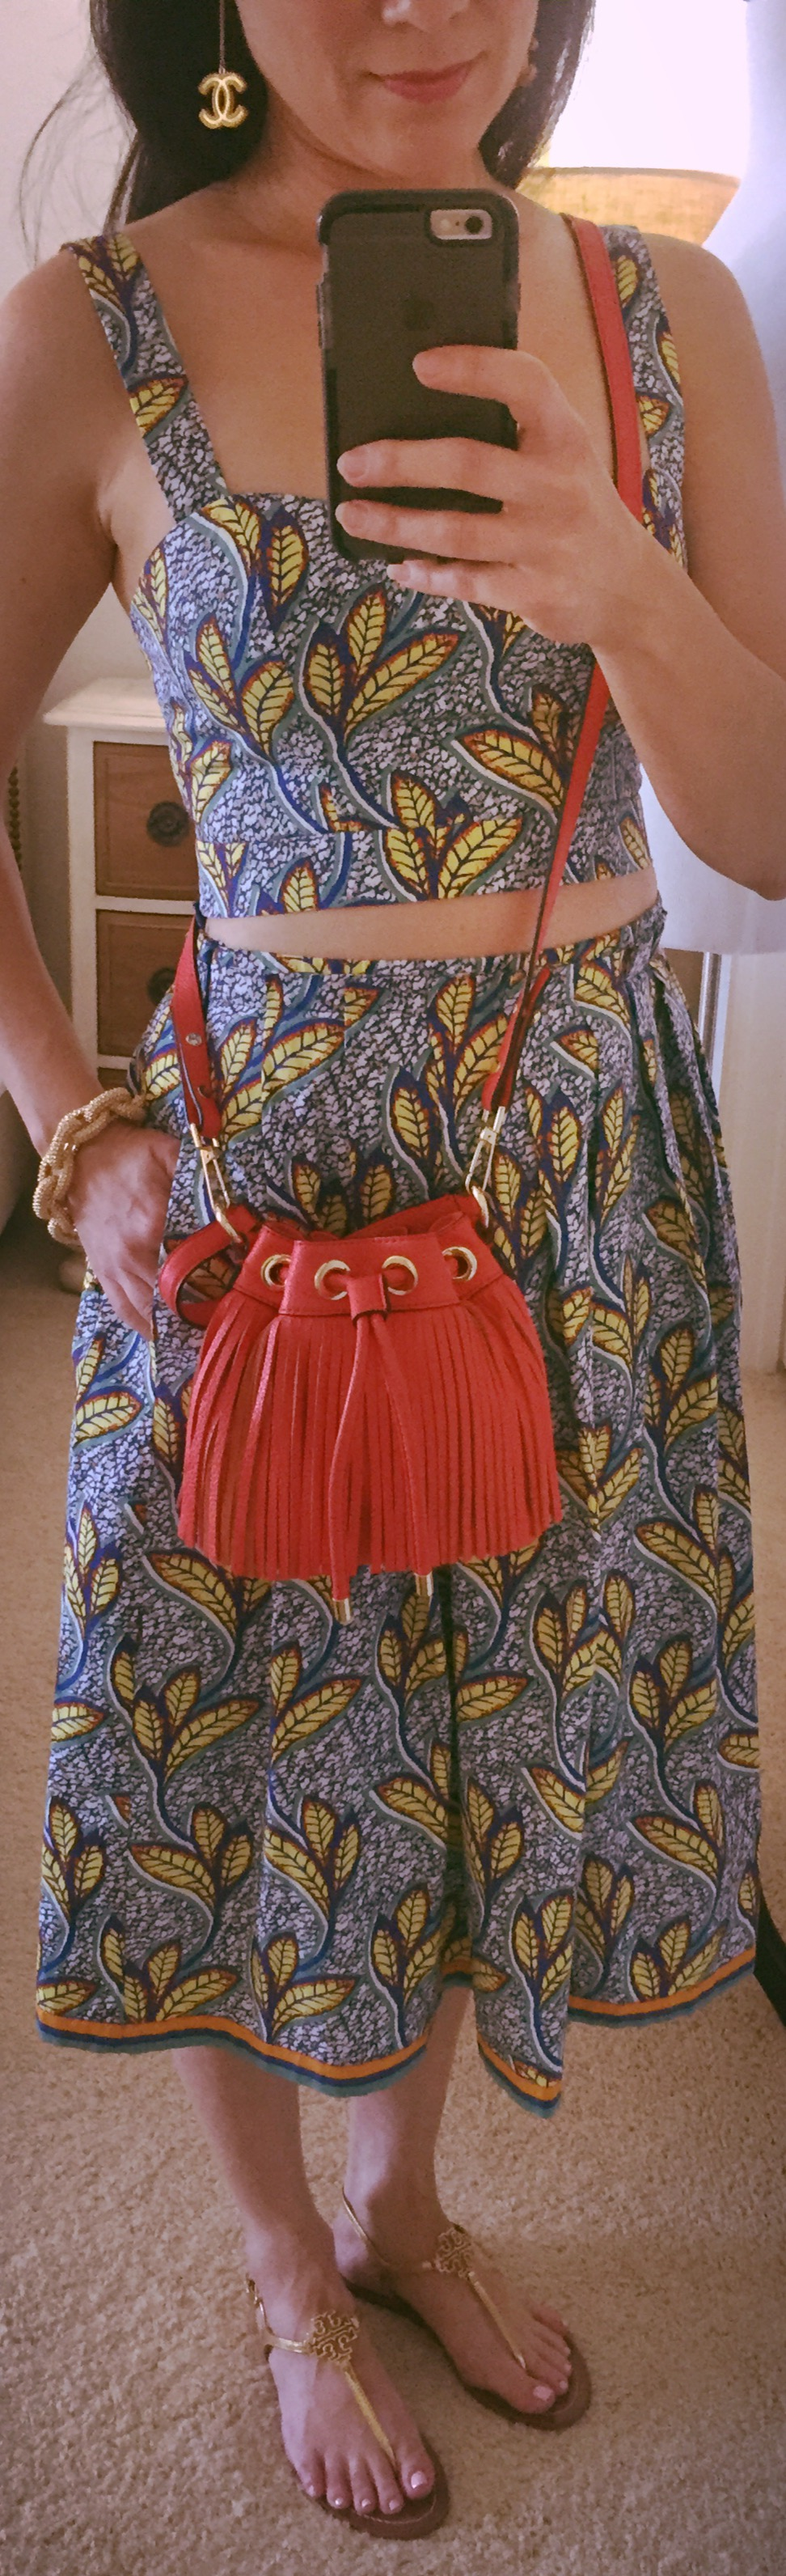 Aug 9th Printed Crop Top & Skirt by Zara